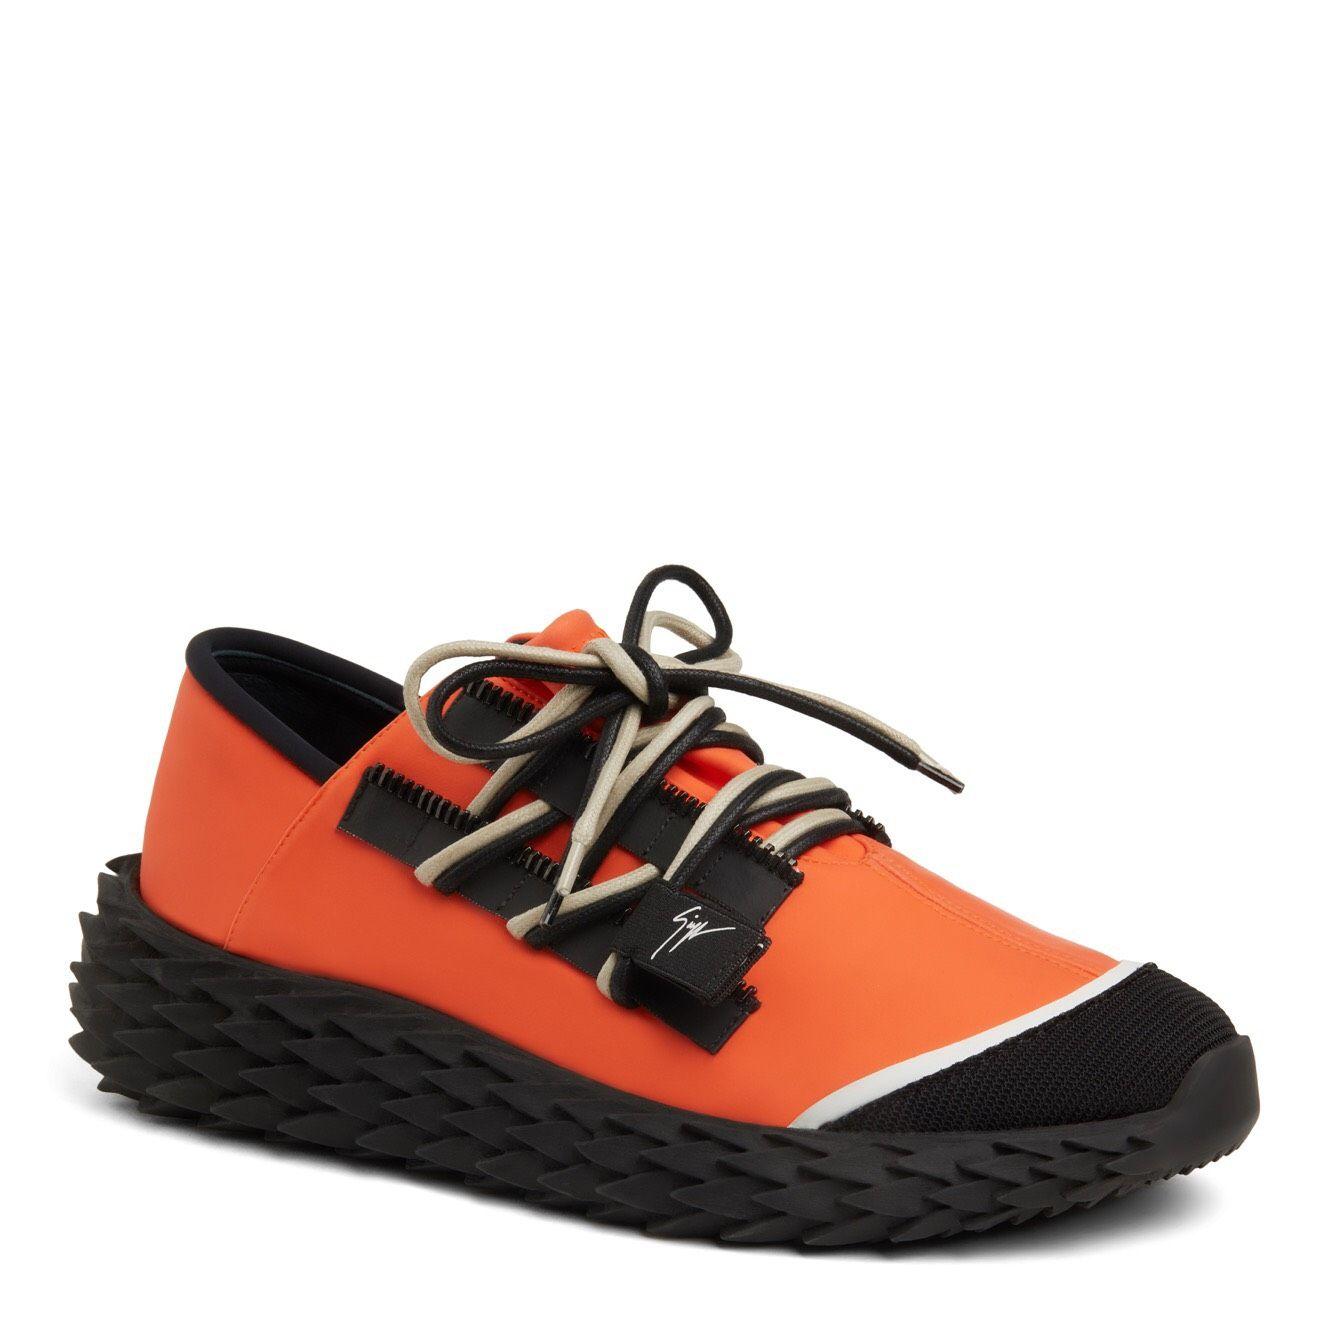 ec5386c85 Giuseppe Zanotti - Urchin  sneakers